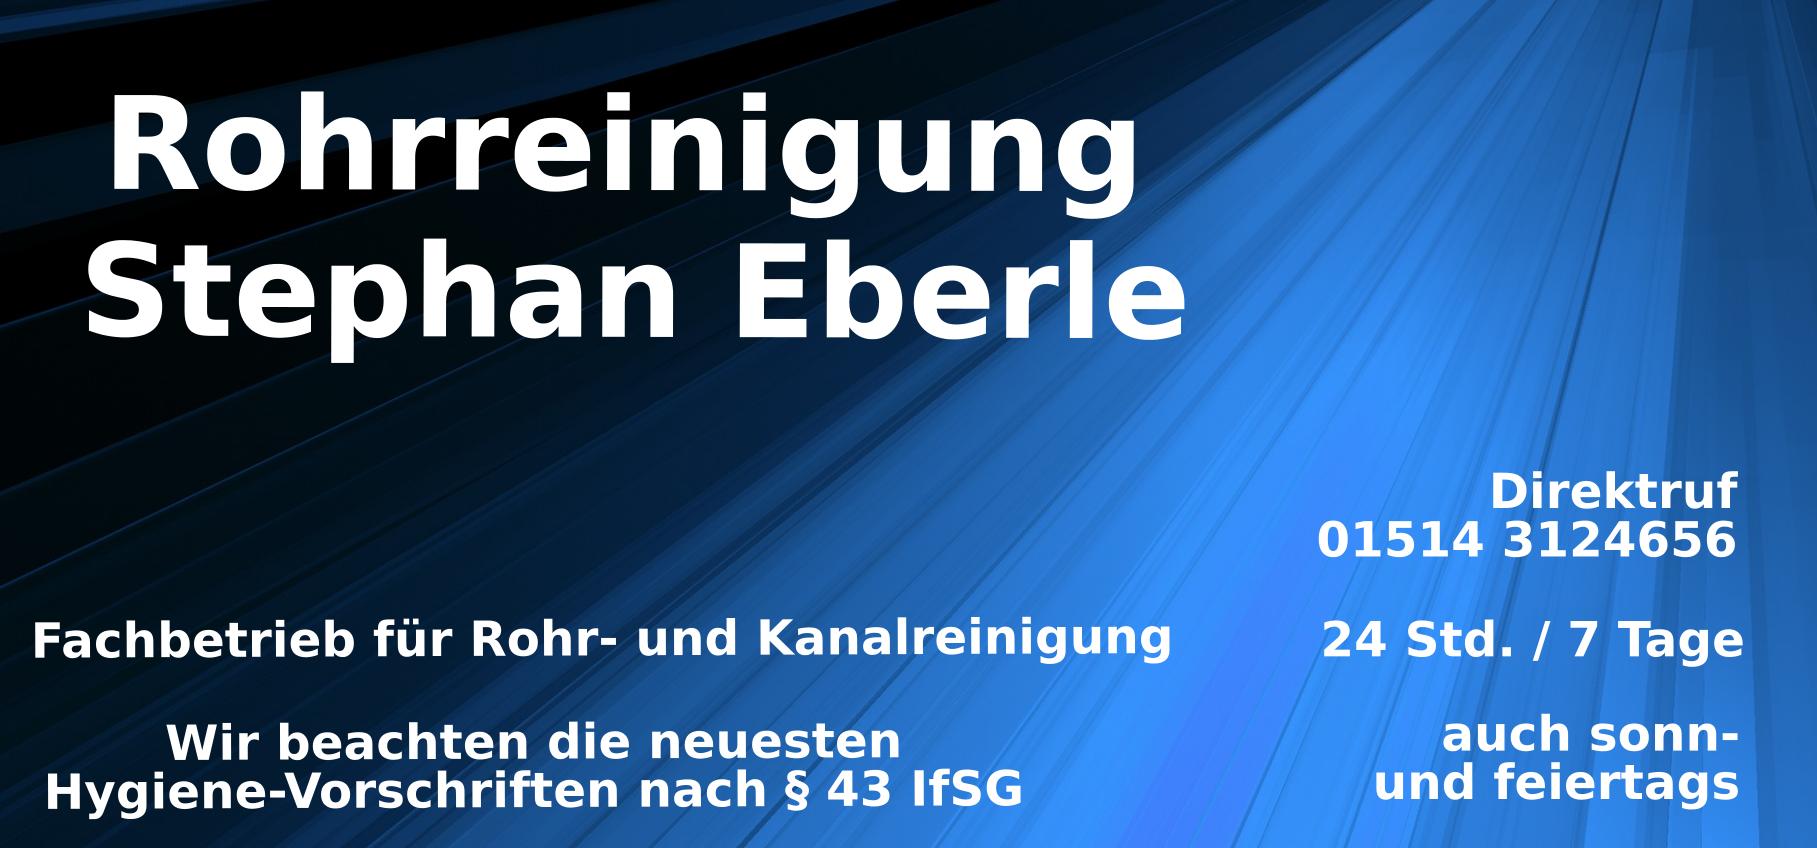 Rohrreinigung Stephan Eberle